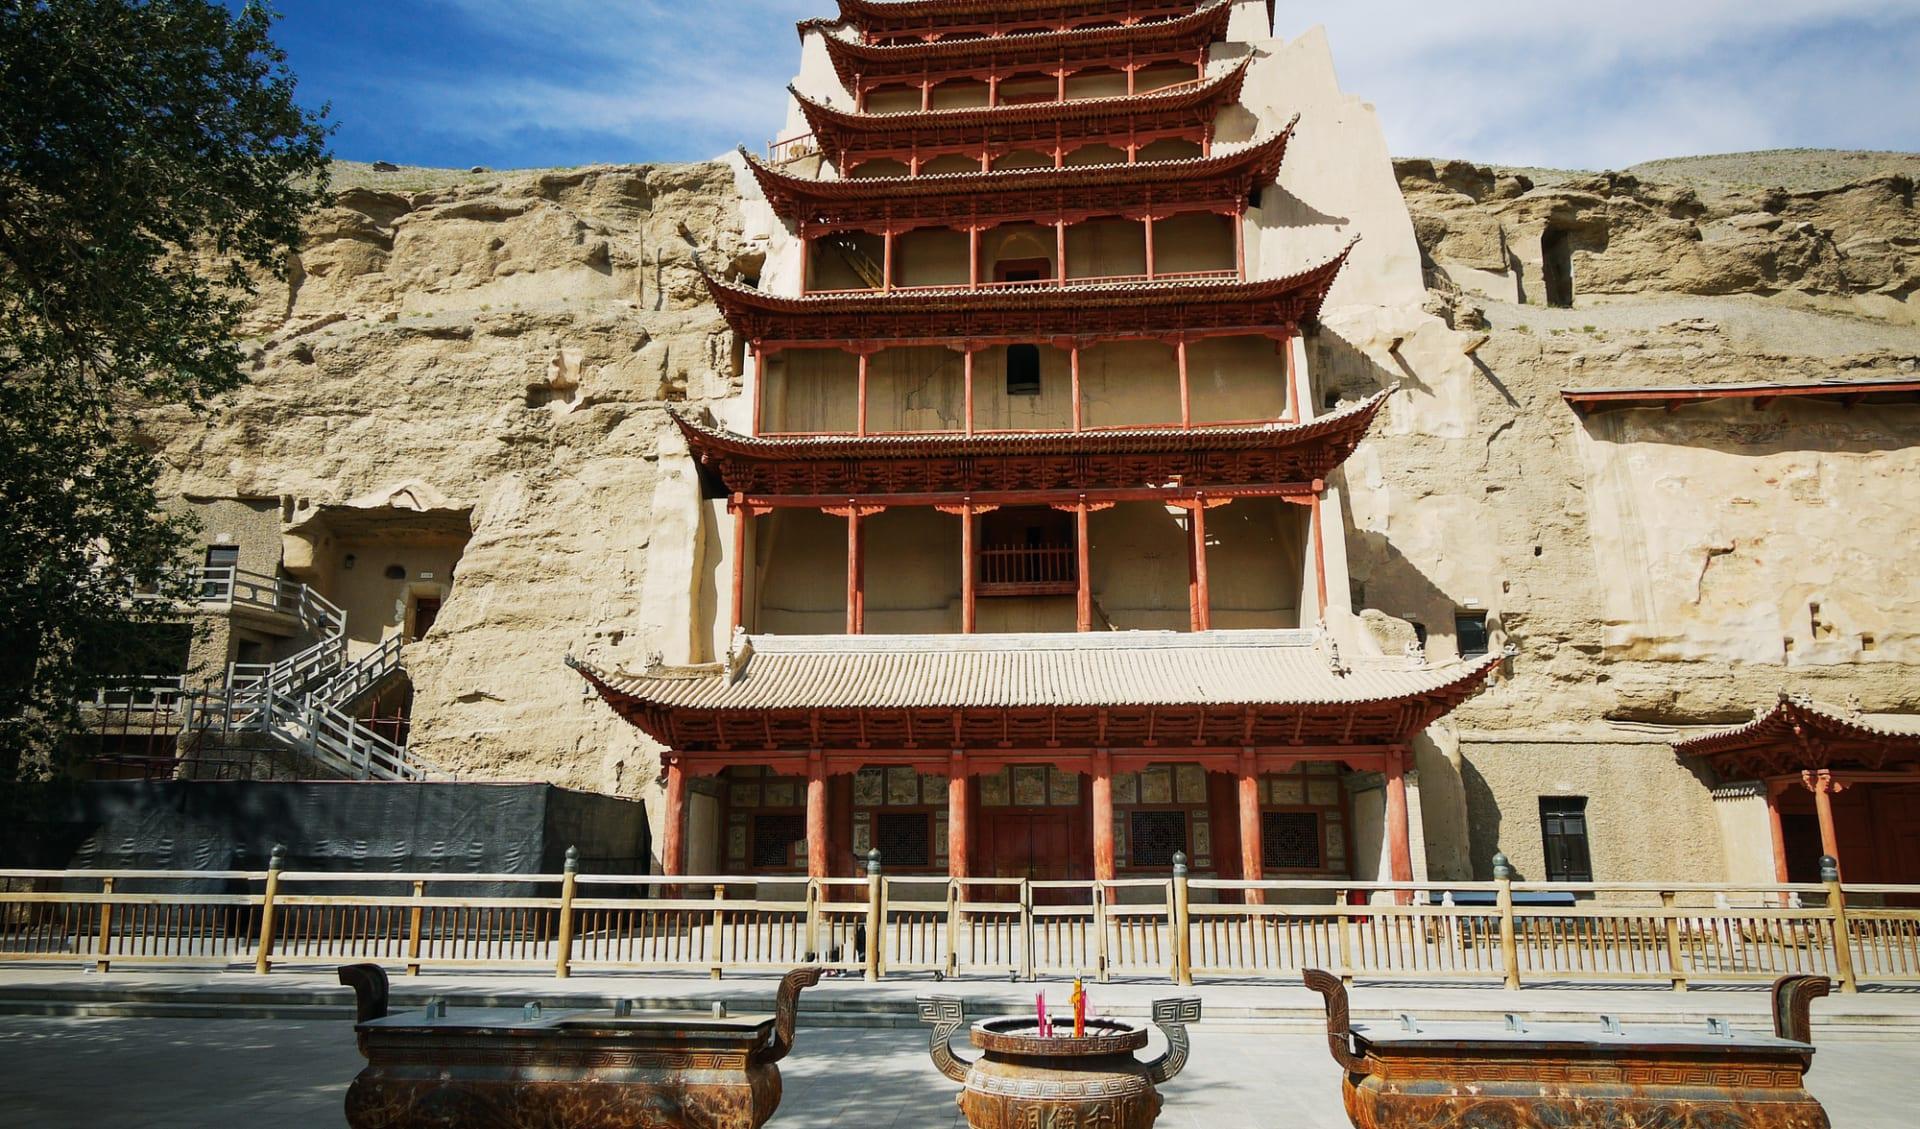 Erlebnis Seidenstrasse ab Kashgar: China_Dunhuang_Tempel_Seidenstrasse_shutterstock_111501836_dfrauchiger